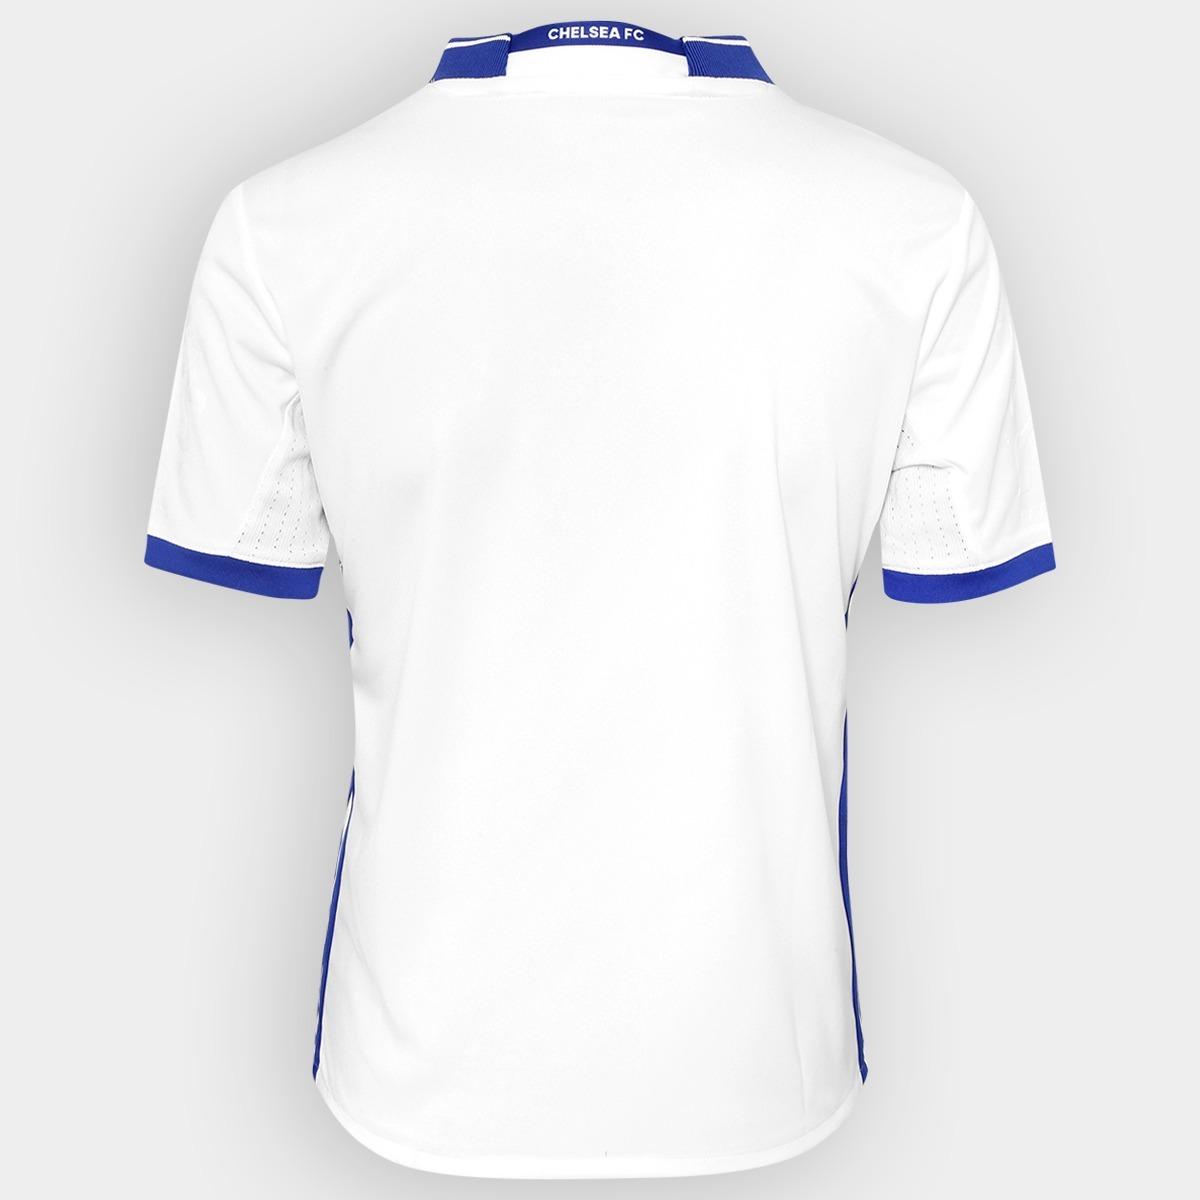 6ce6216f59ccb jersey infantil adidas chelsea tercero 16 17 camisa original. Cargando zoom.